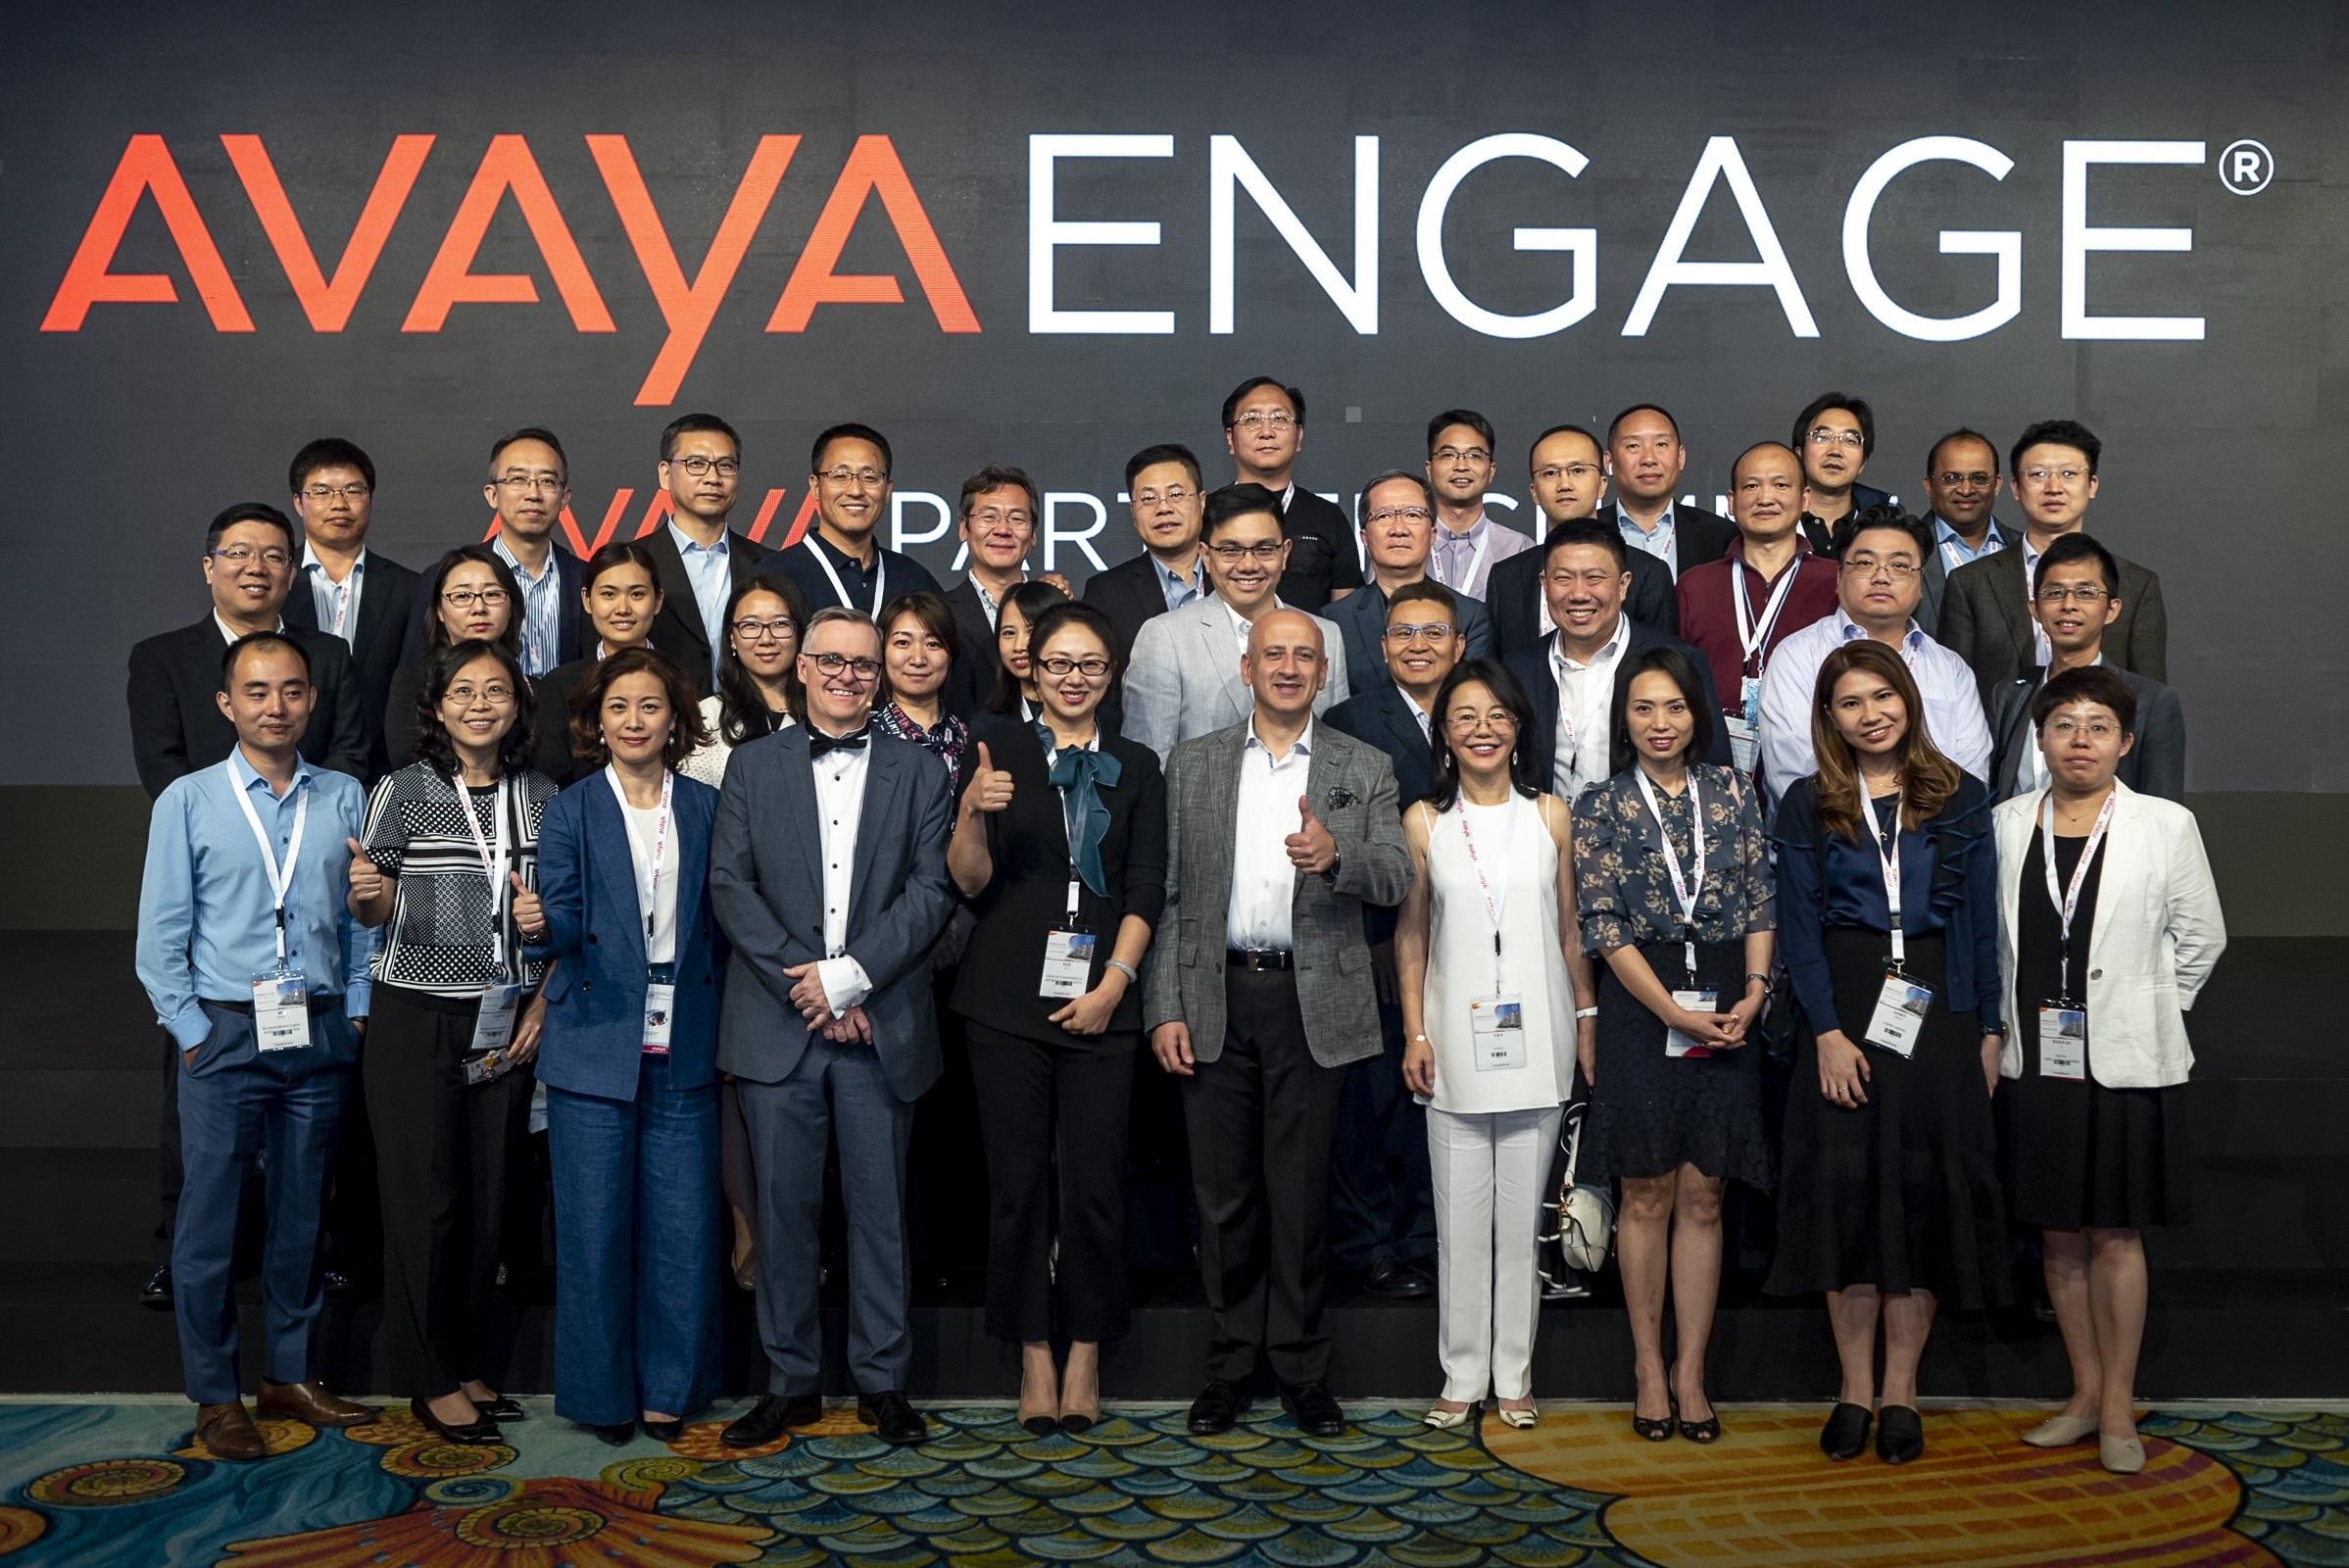 Avaya recognizes its channel partners